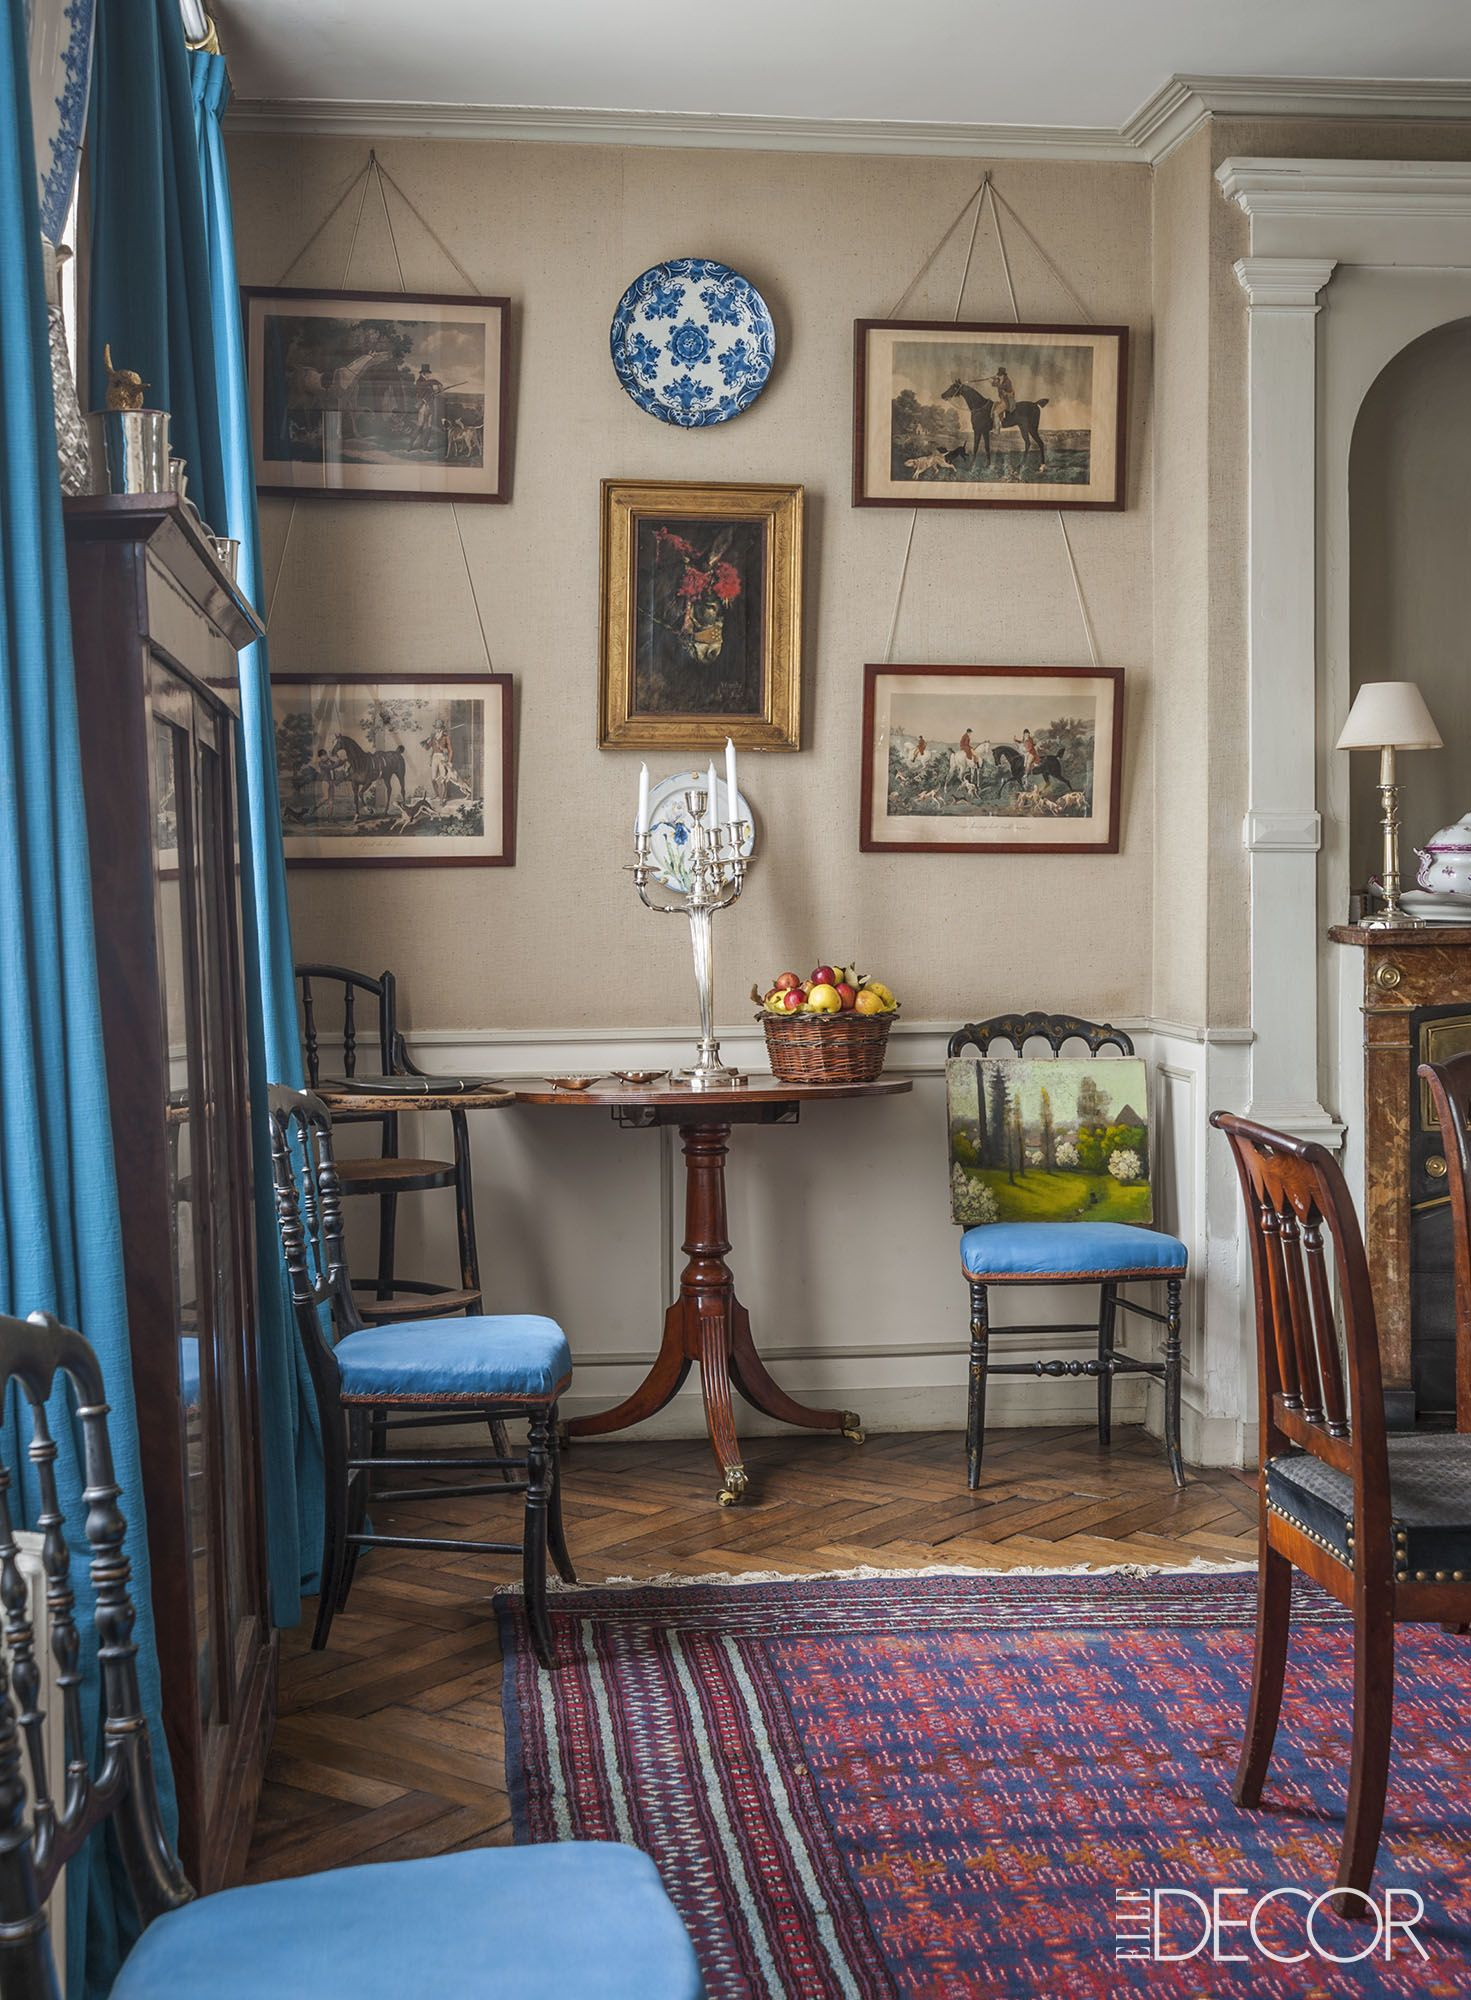 curtain ideas & 50 Inspiring Curtain Ideas - Window Drapes for Living Rooms